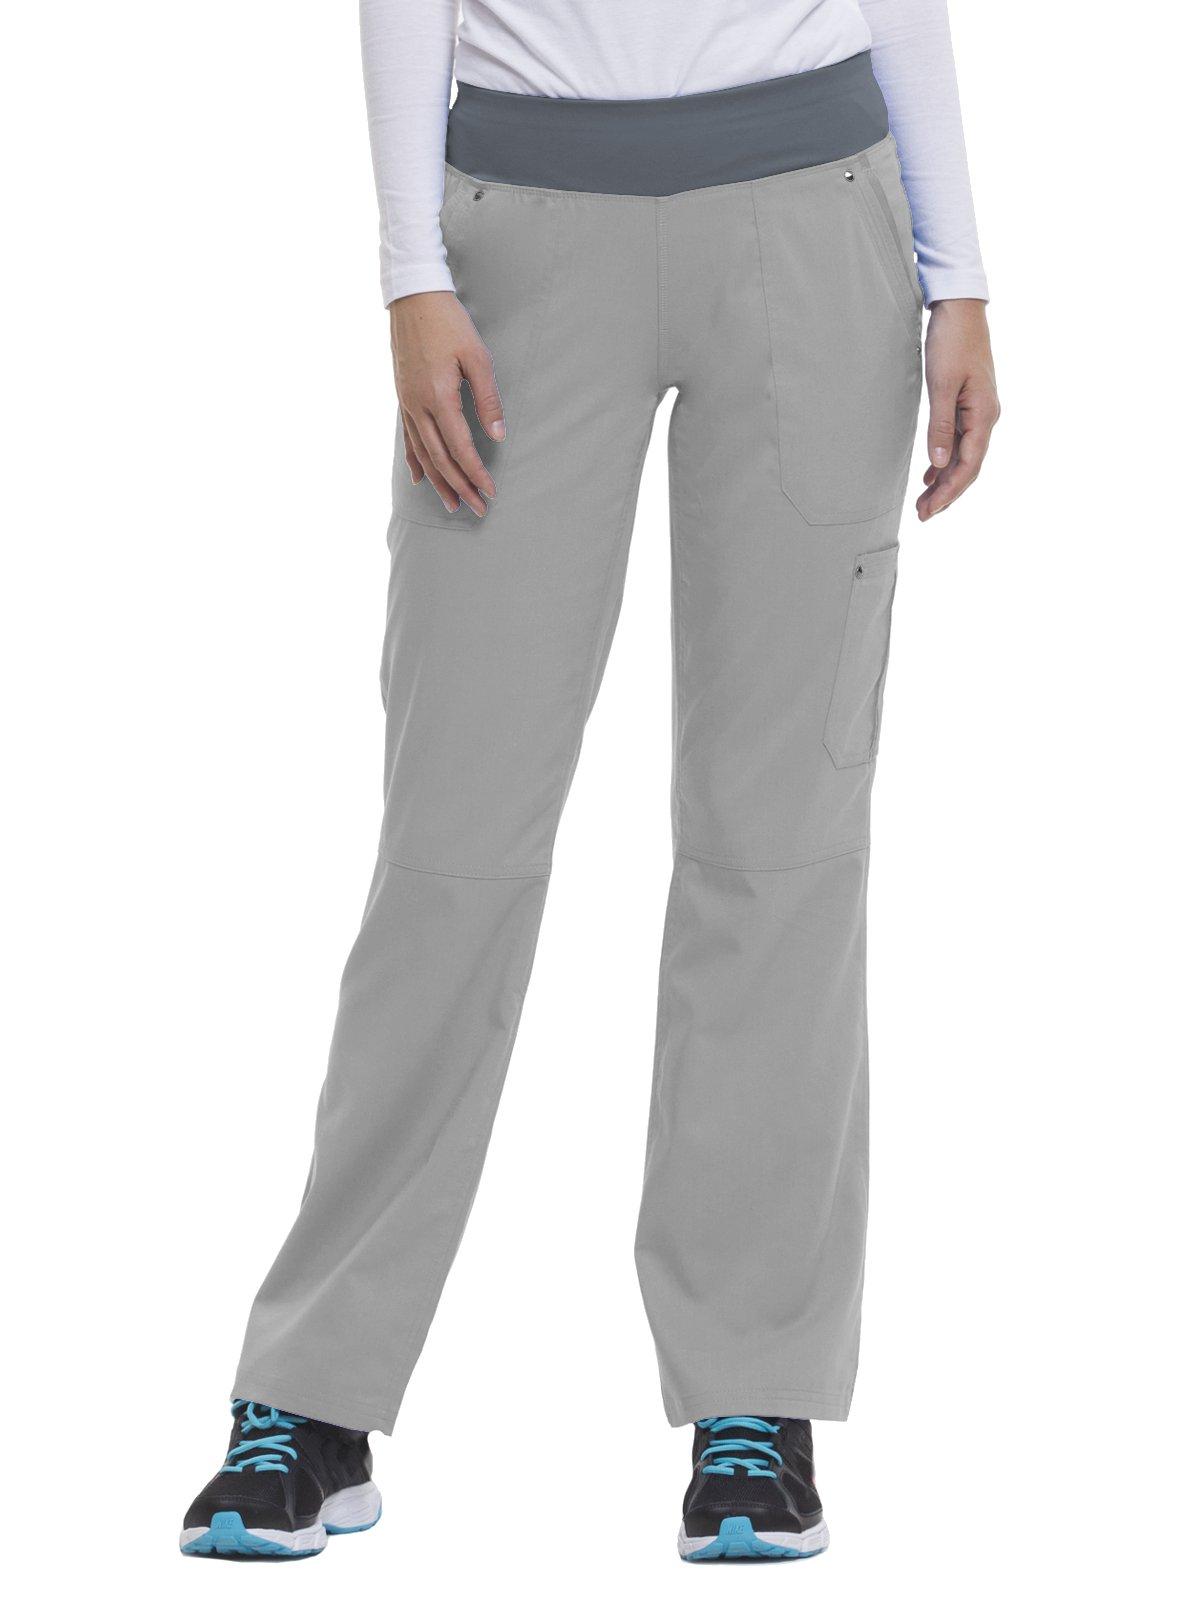 Purple Label by Healing Hands Scrubs Women's Tori 9133 5 Pocket Knit Waist Pant Grey/Pewter- X-Large Petite